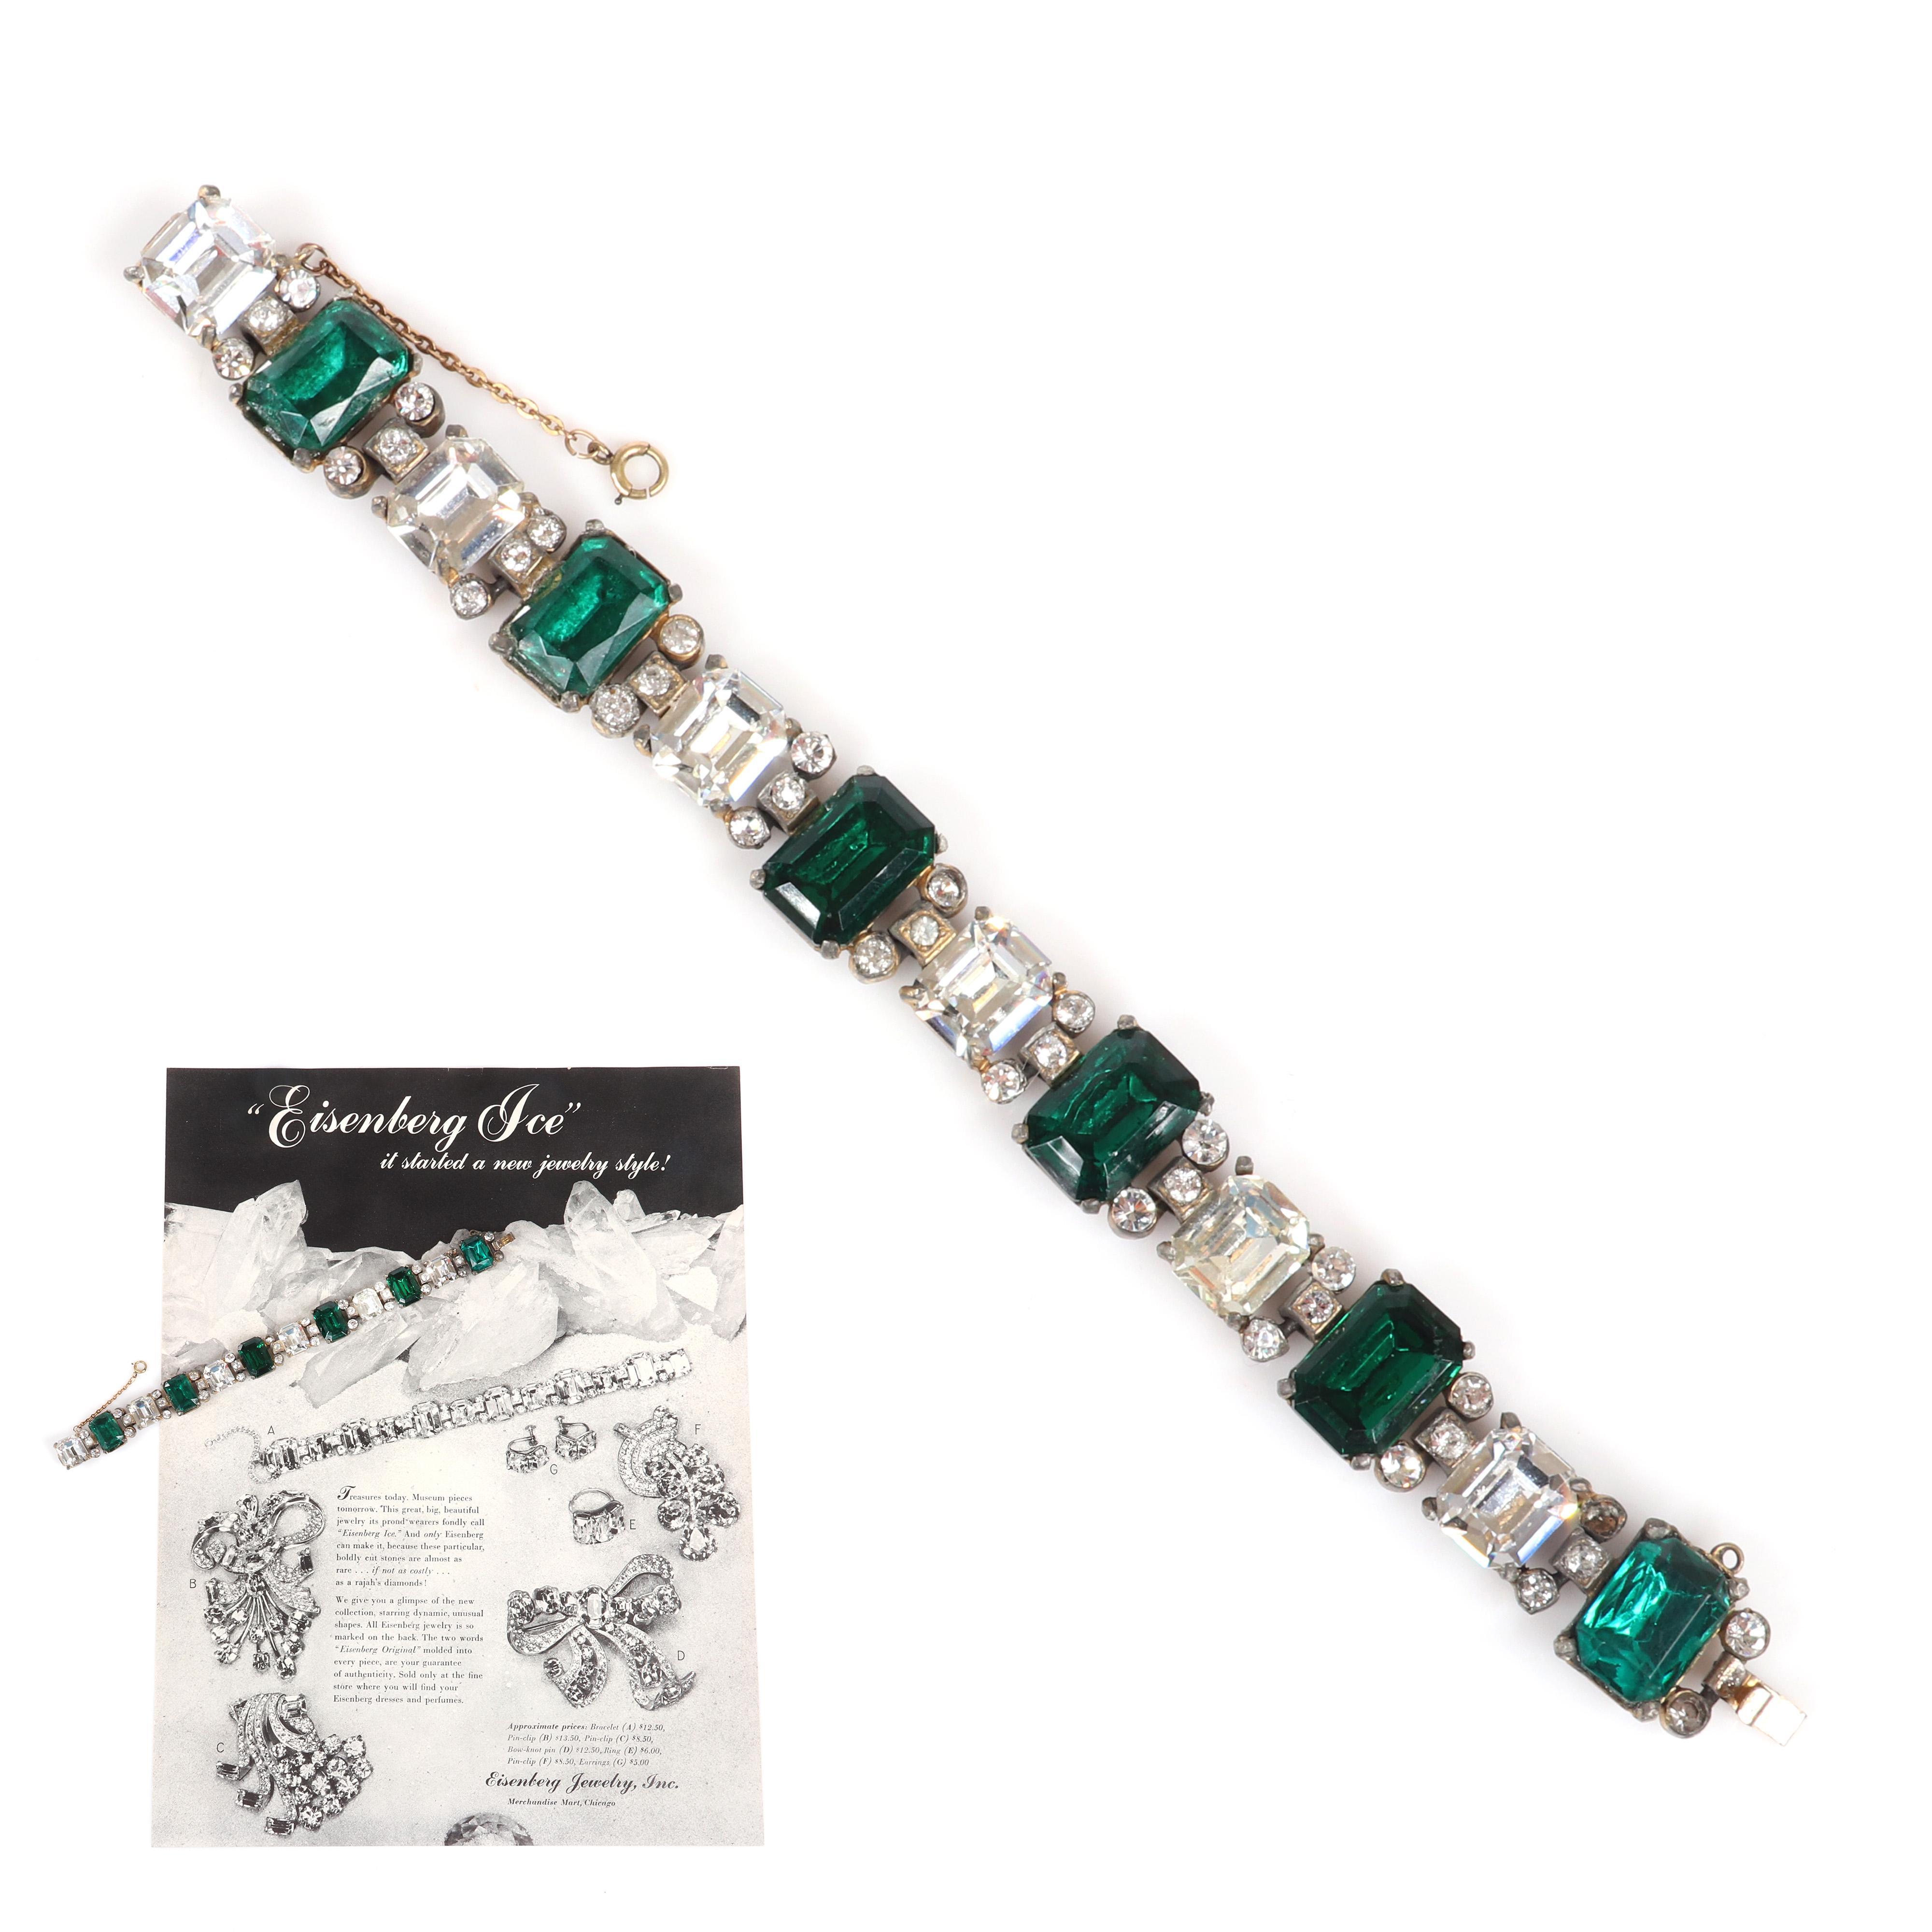 "Eisenberg Original crystal bracelet with gold pot metal & emerald-cut clear & green center stones. Includes original advertisement highlighting a version of this bracelet, c. 1942. 7 1/2""L x 5/8""W"